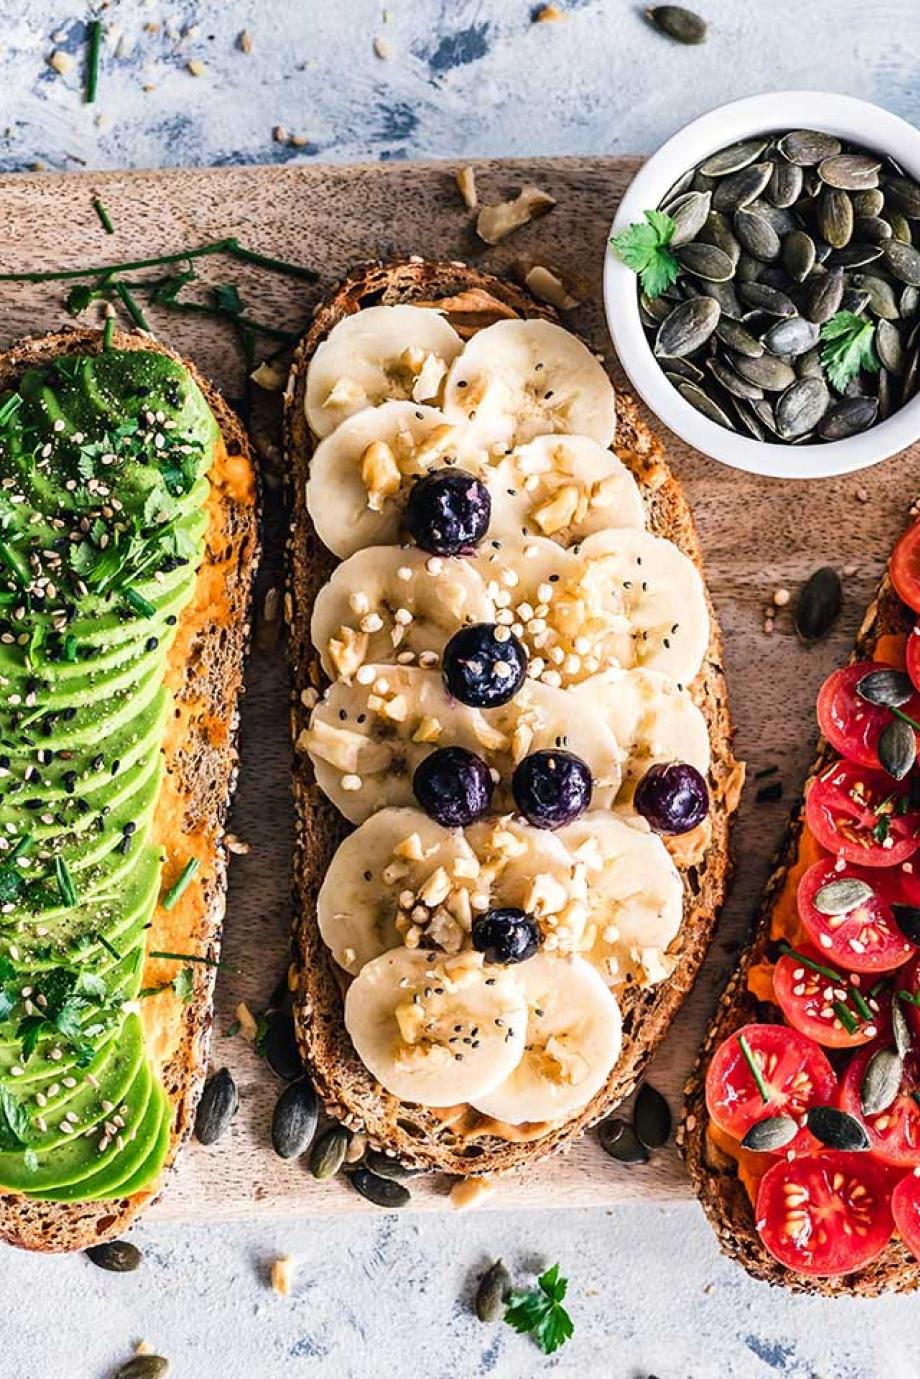 LisboaCool_Blog_5 Vegan Restaurants to visit in Lisbon